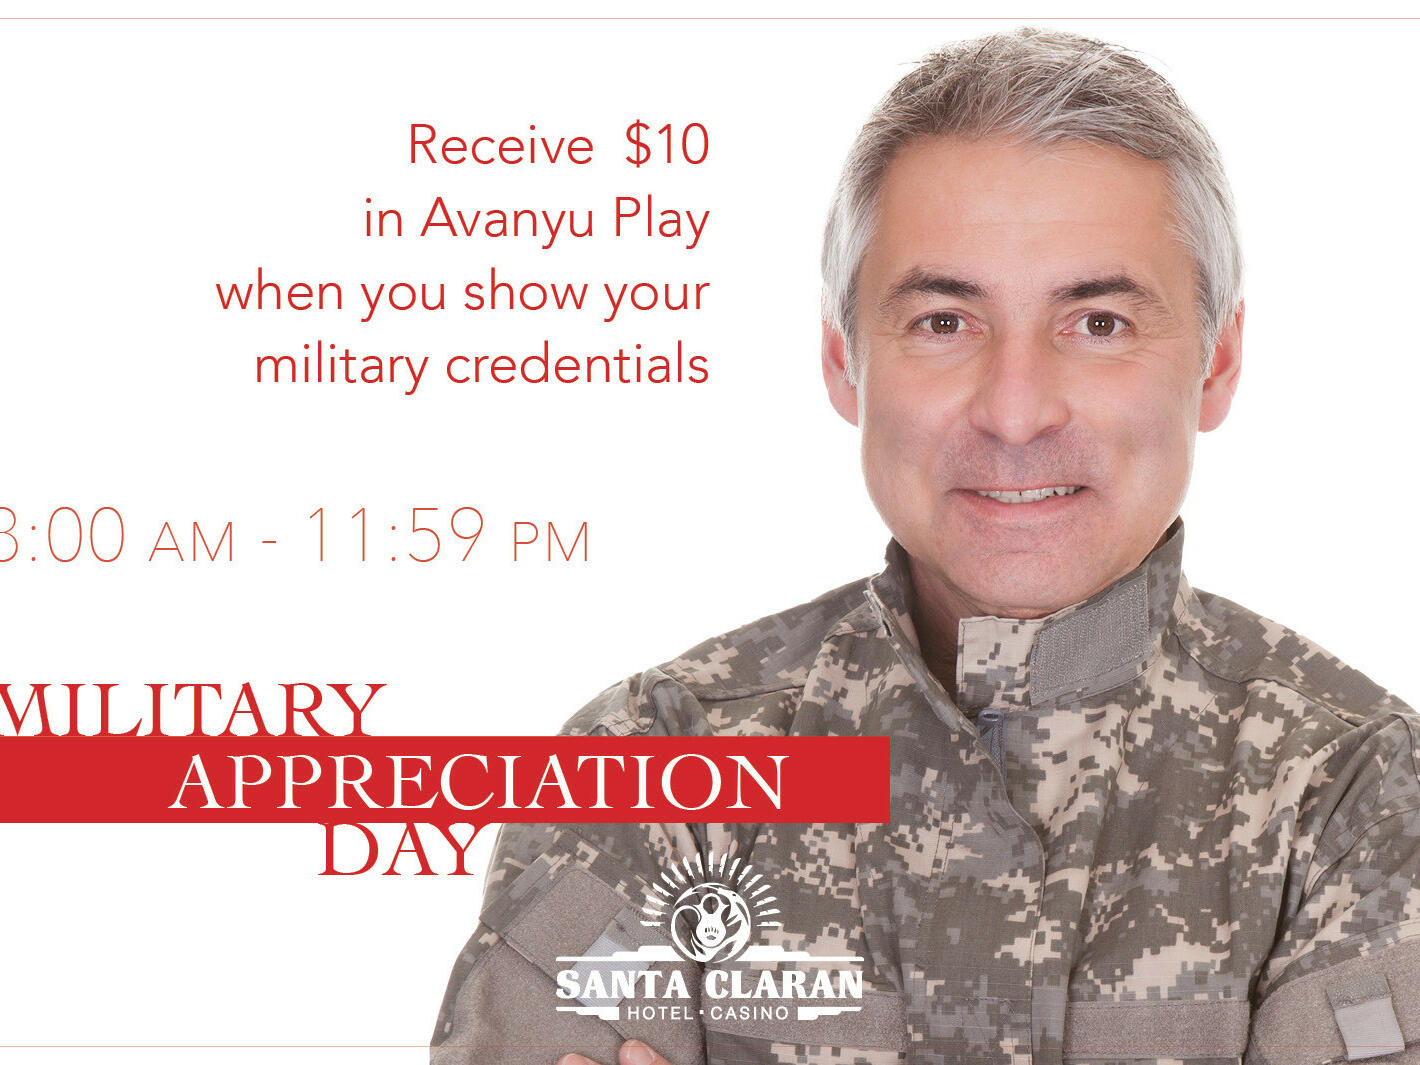 Poster of Military Appreciation Day at Santa Claran Hotel Casino